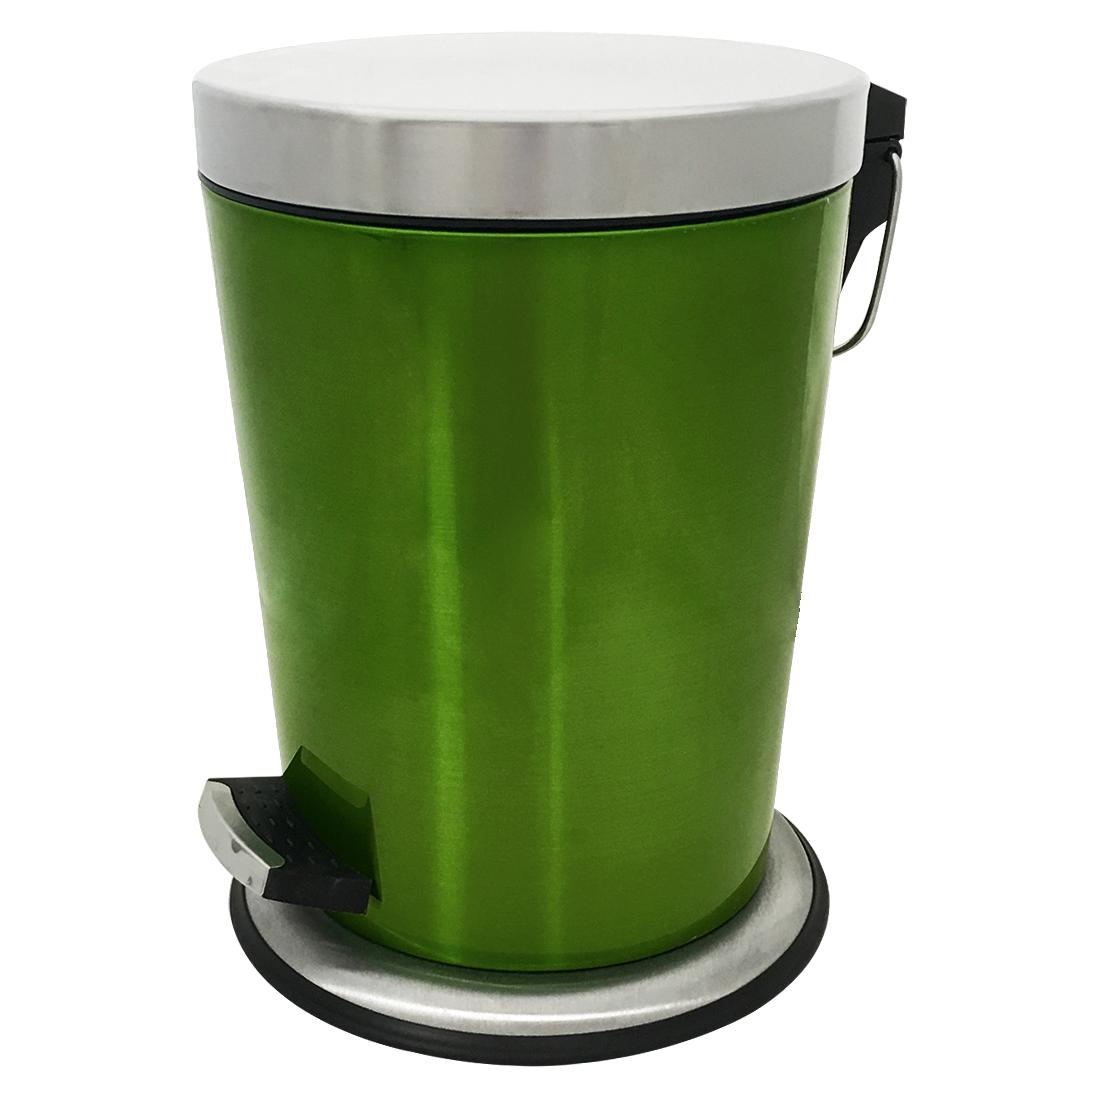 Mülleimer Abfalleimer Treteimer Müllsammler Badeimer Edelstahl Küche #463  eBay